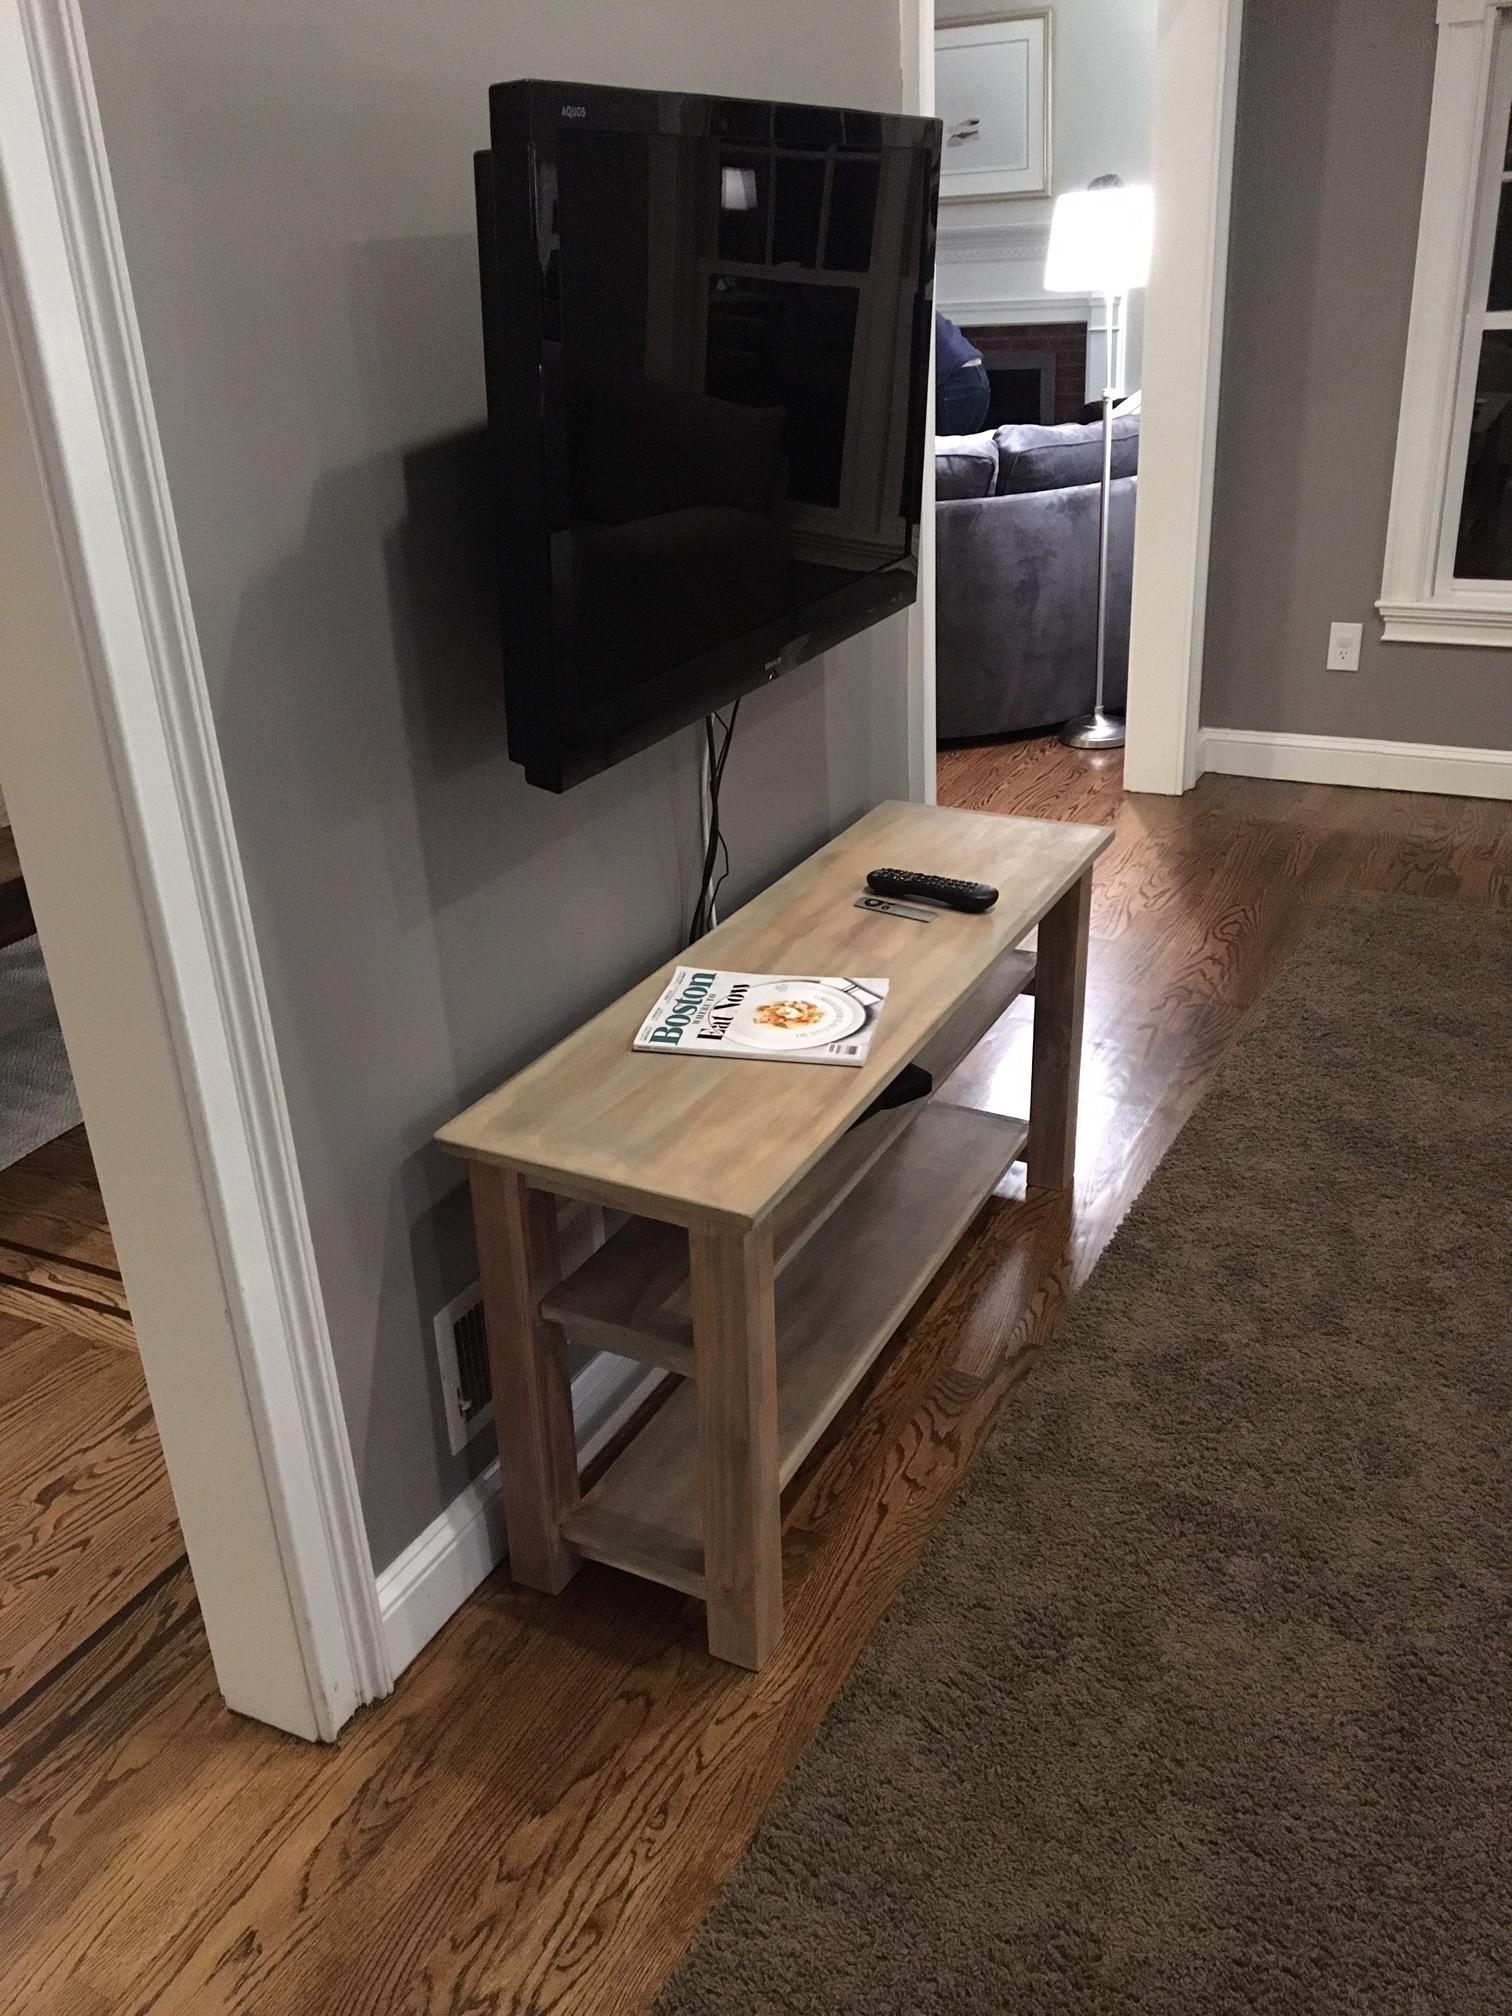 console table.JPG